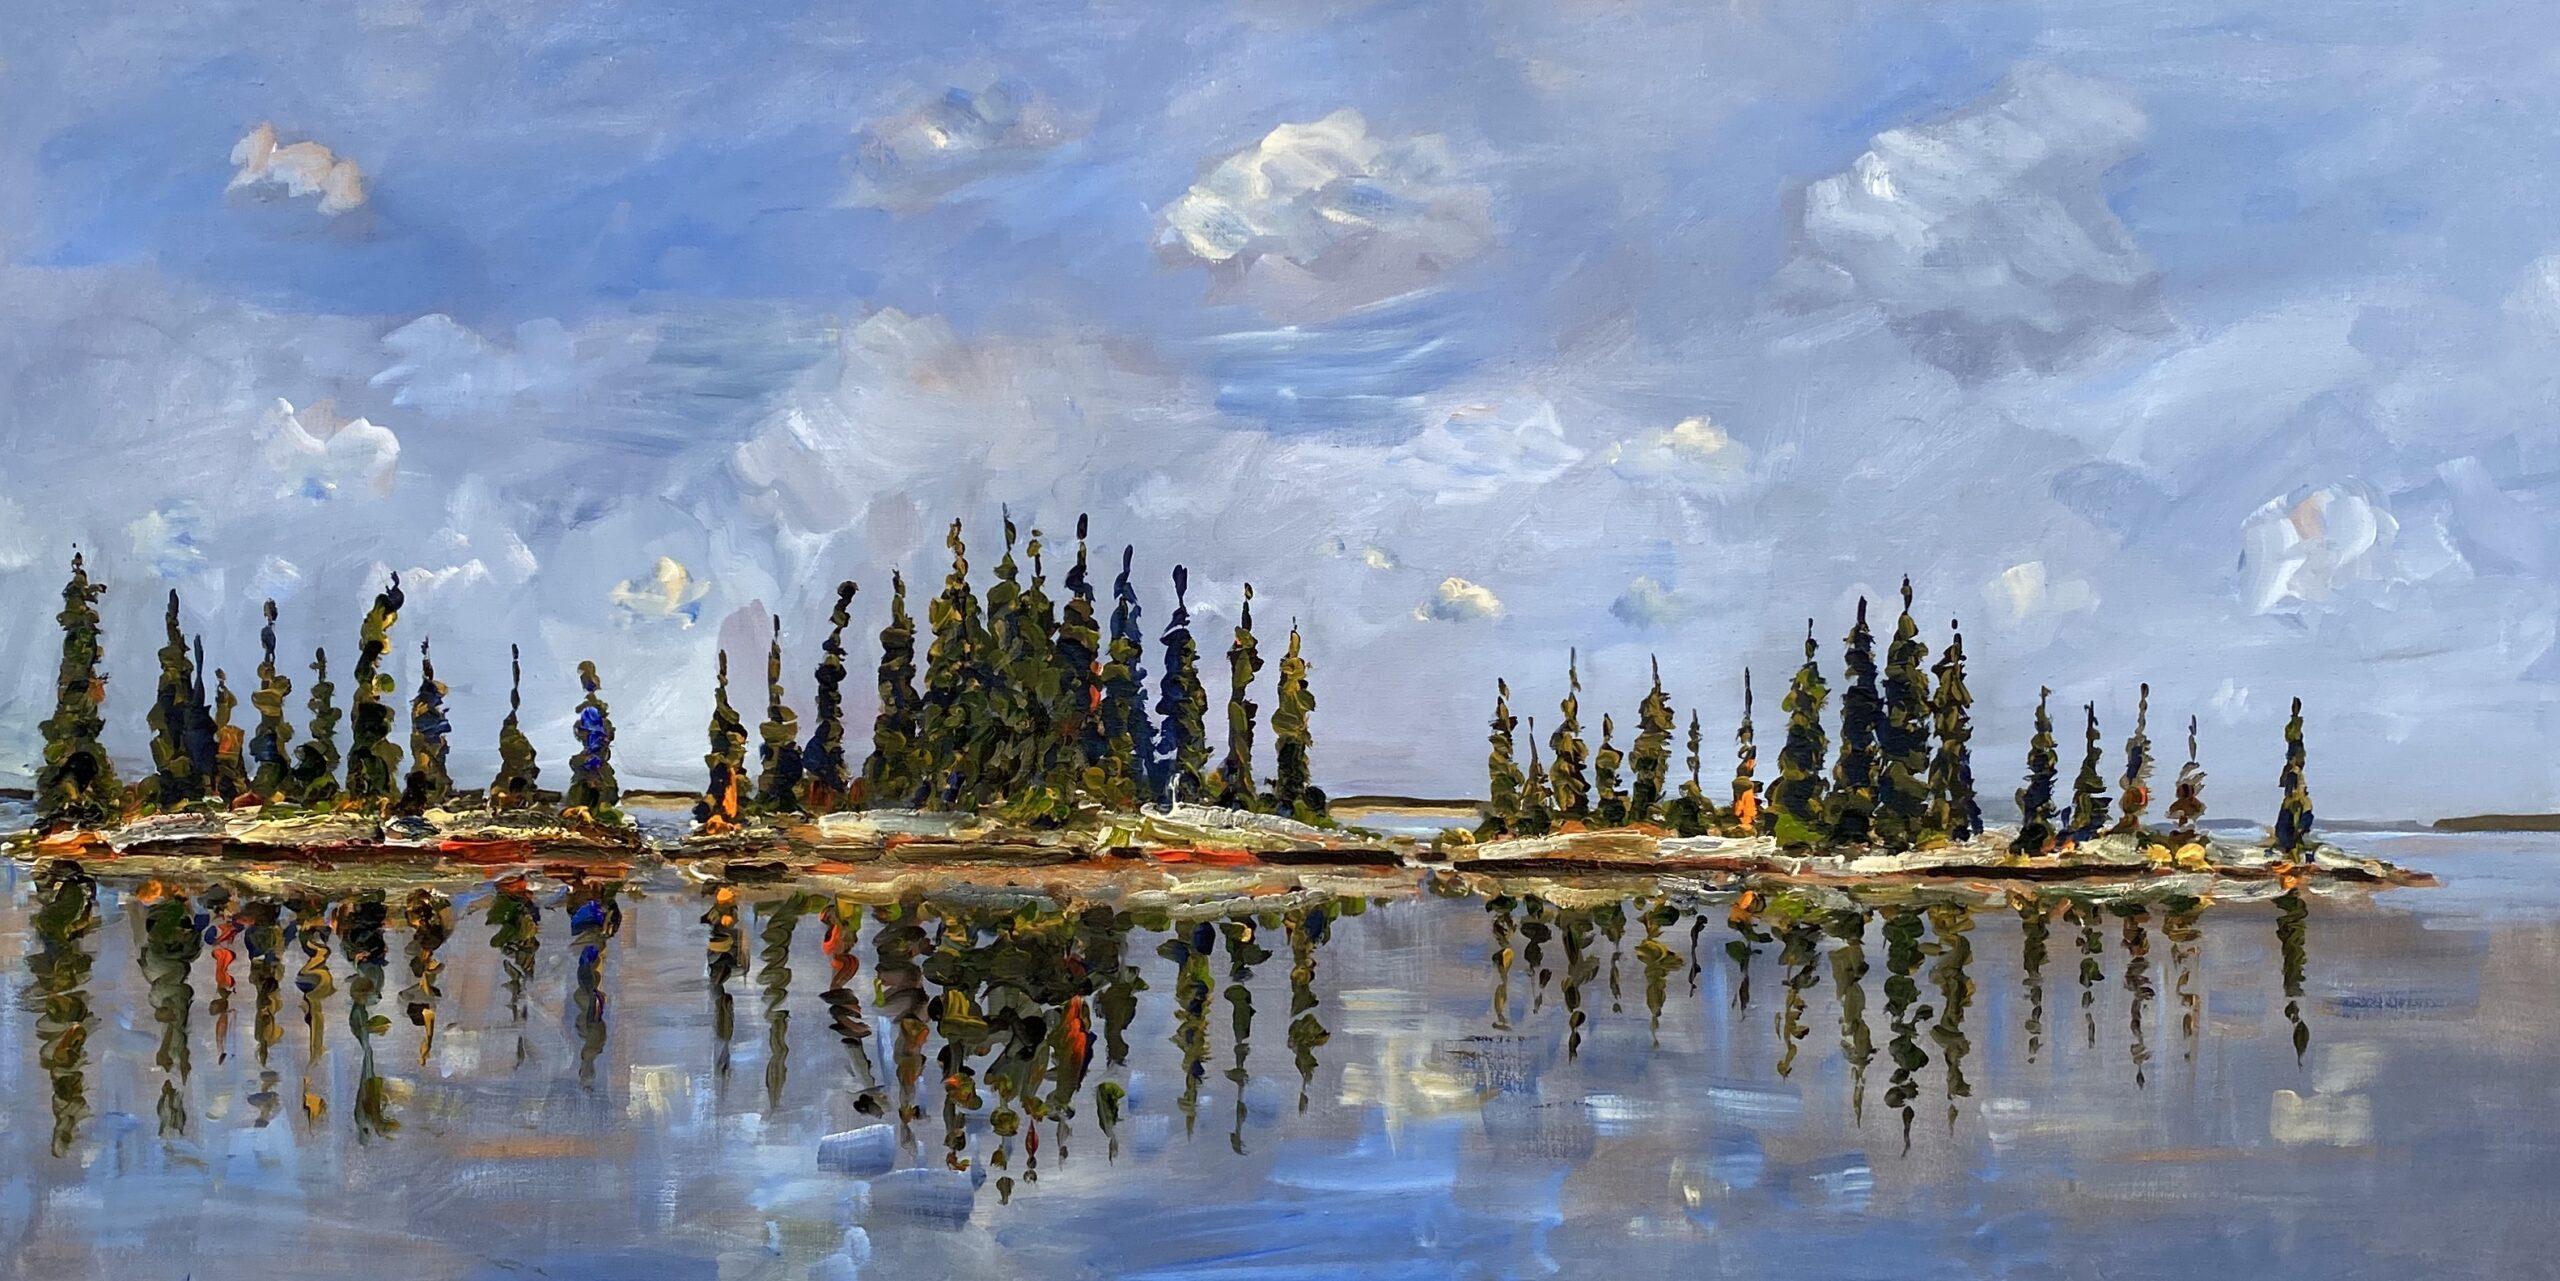 Little Islands, Mid Day 2020 acrylic on linen 43 x 80